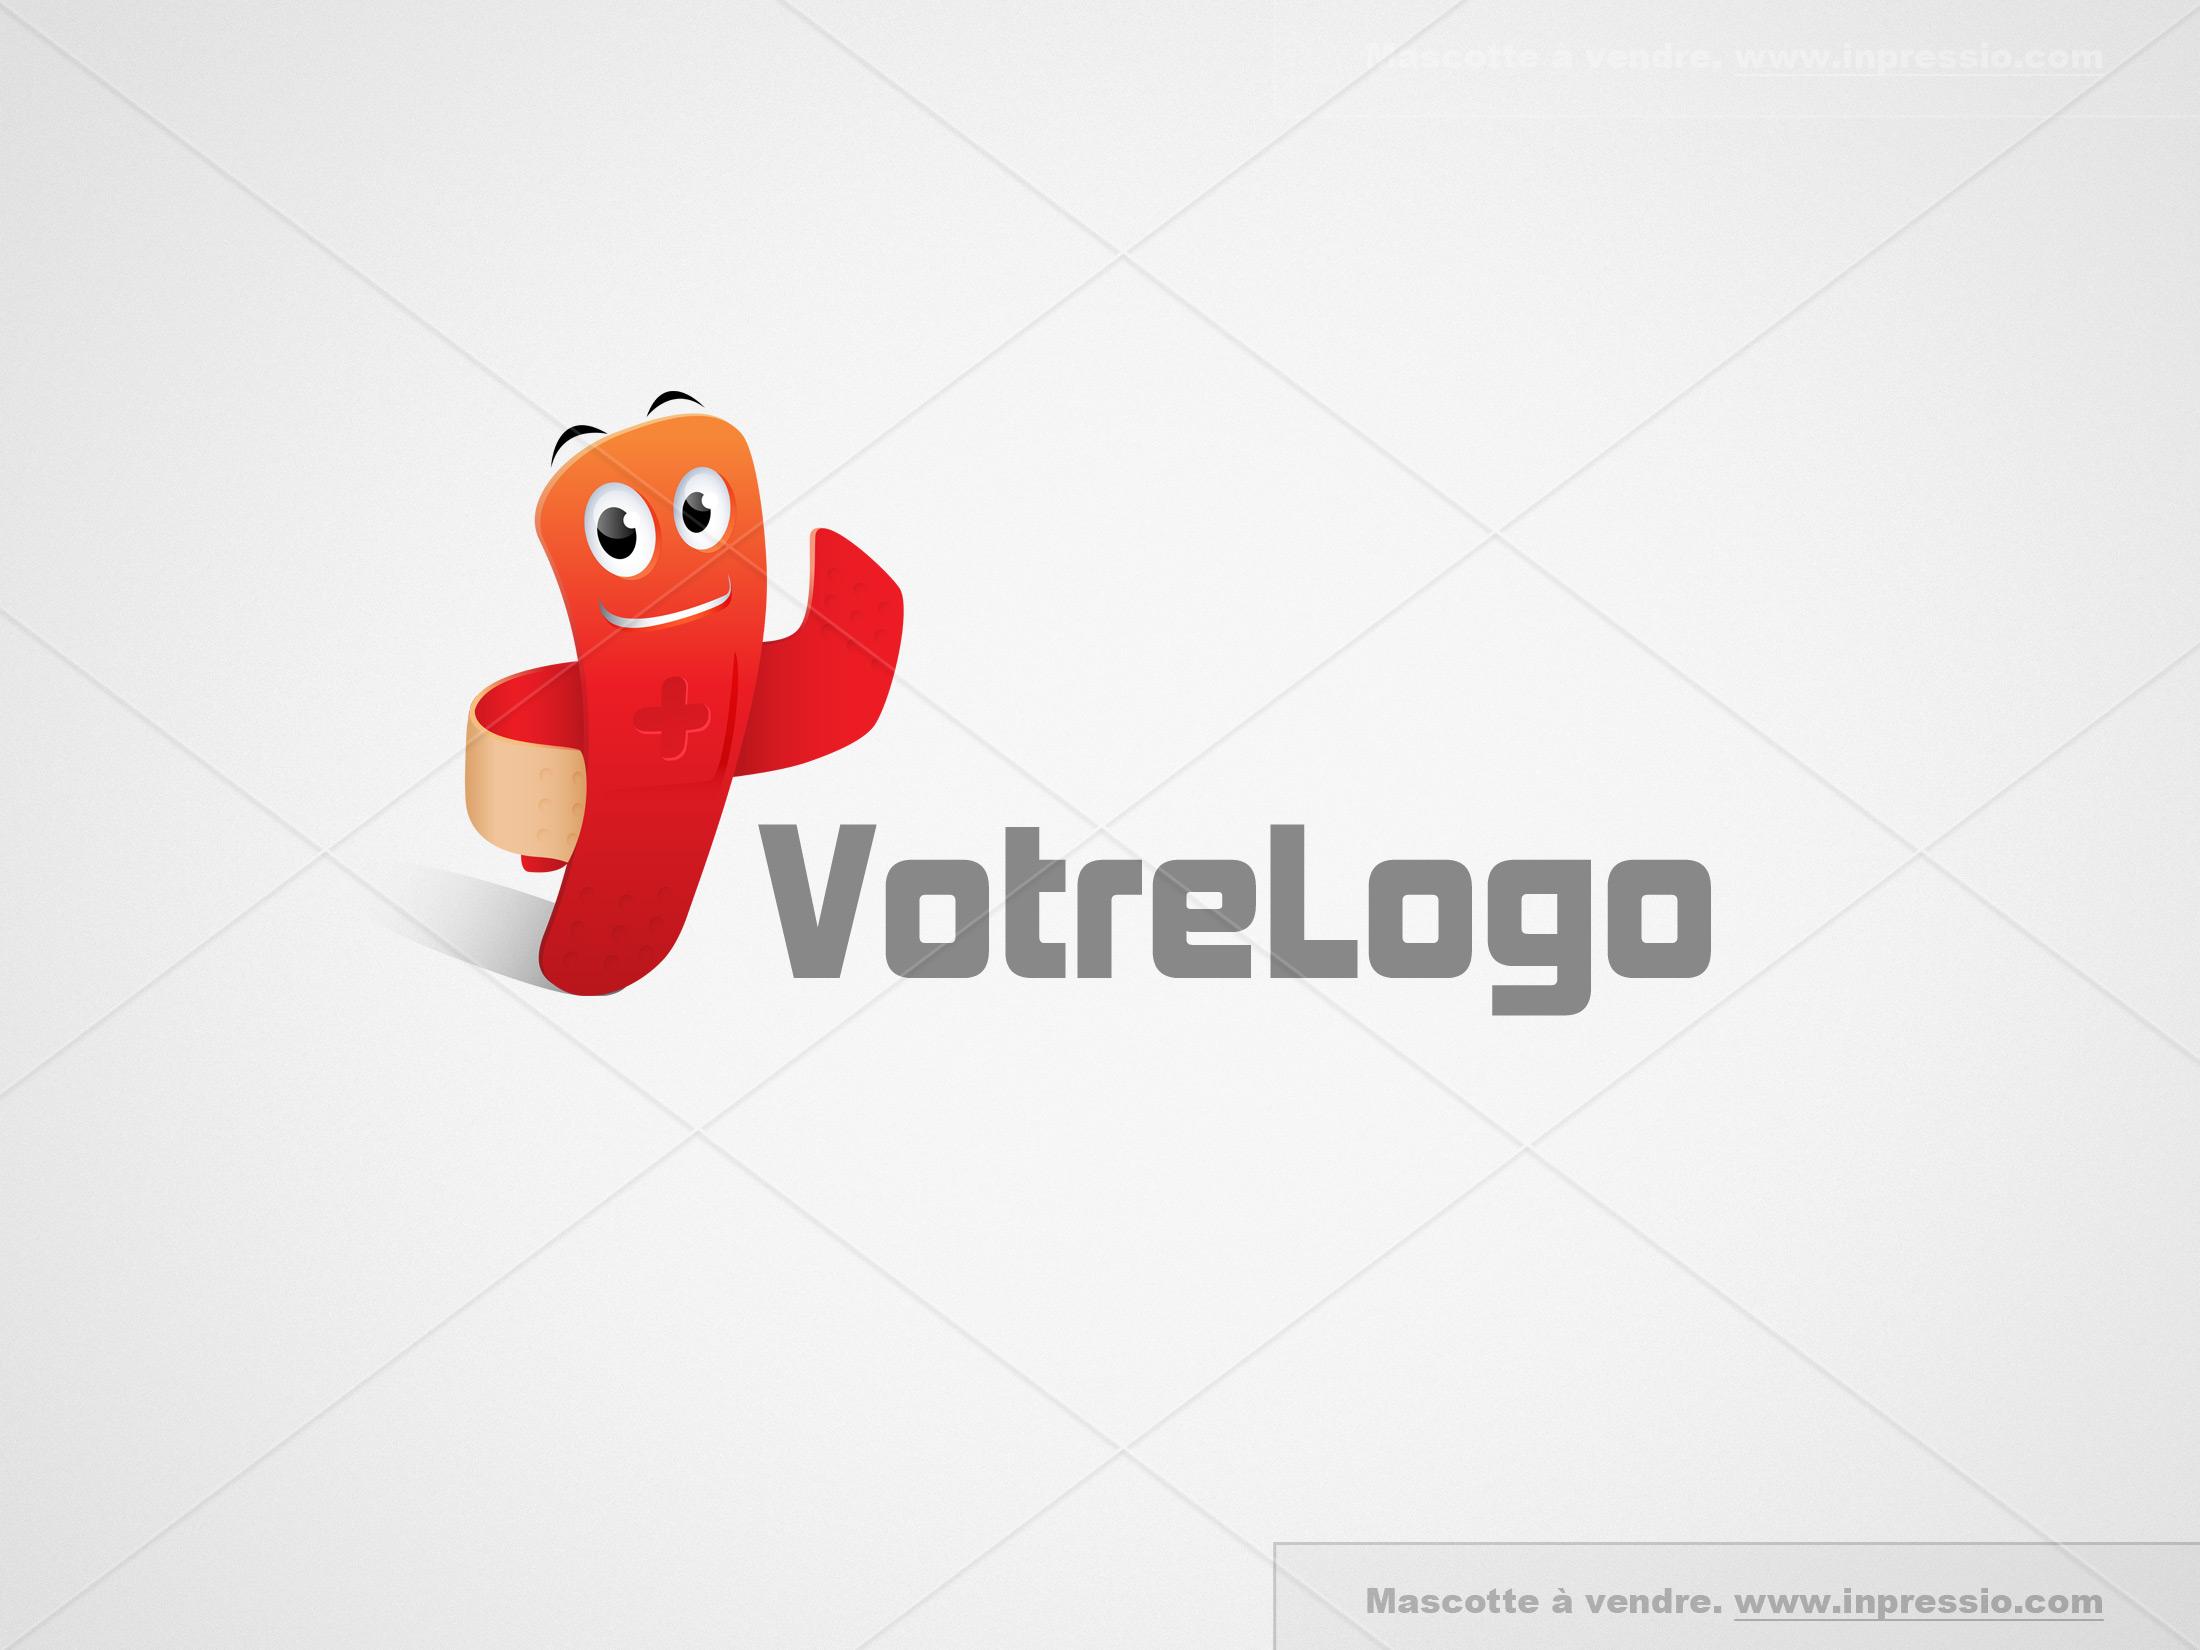 Plaster - Logo/Mascotte à vendre